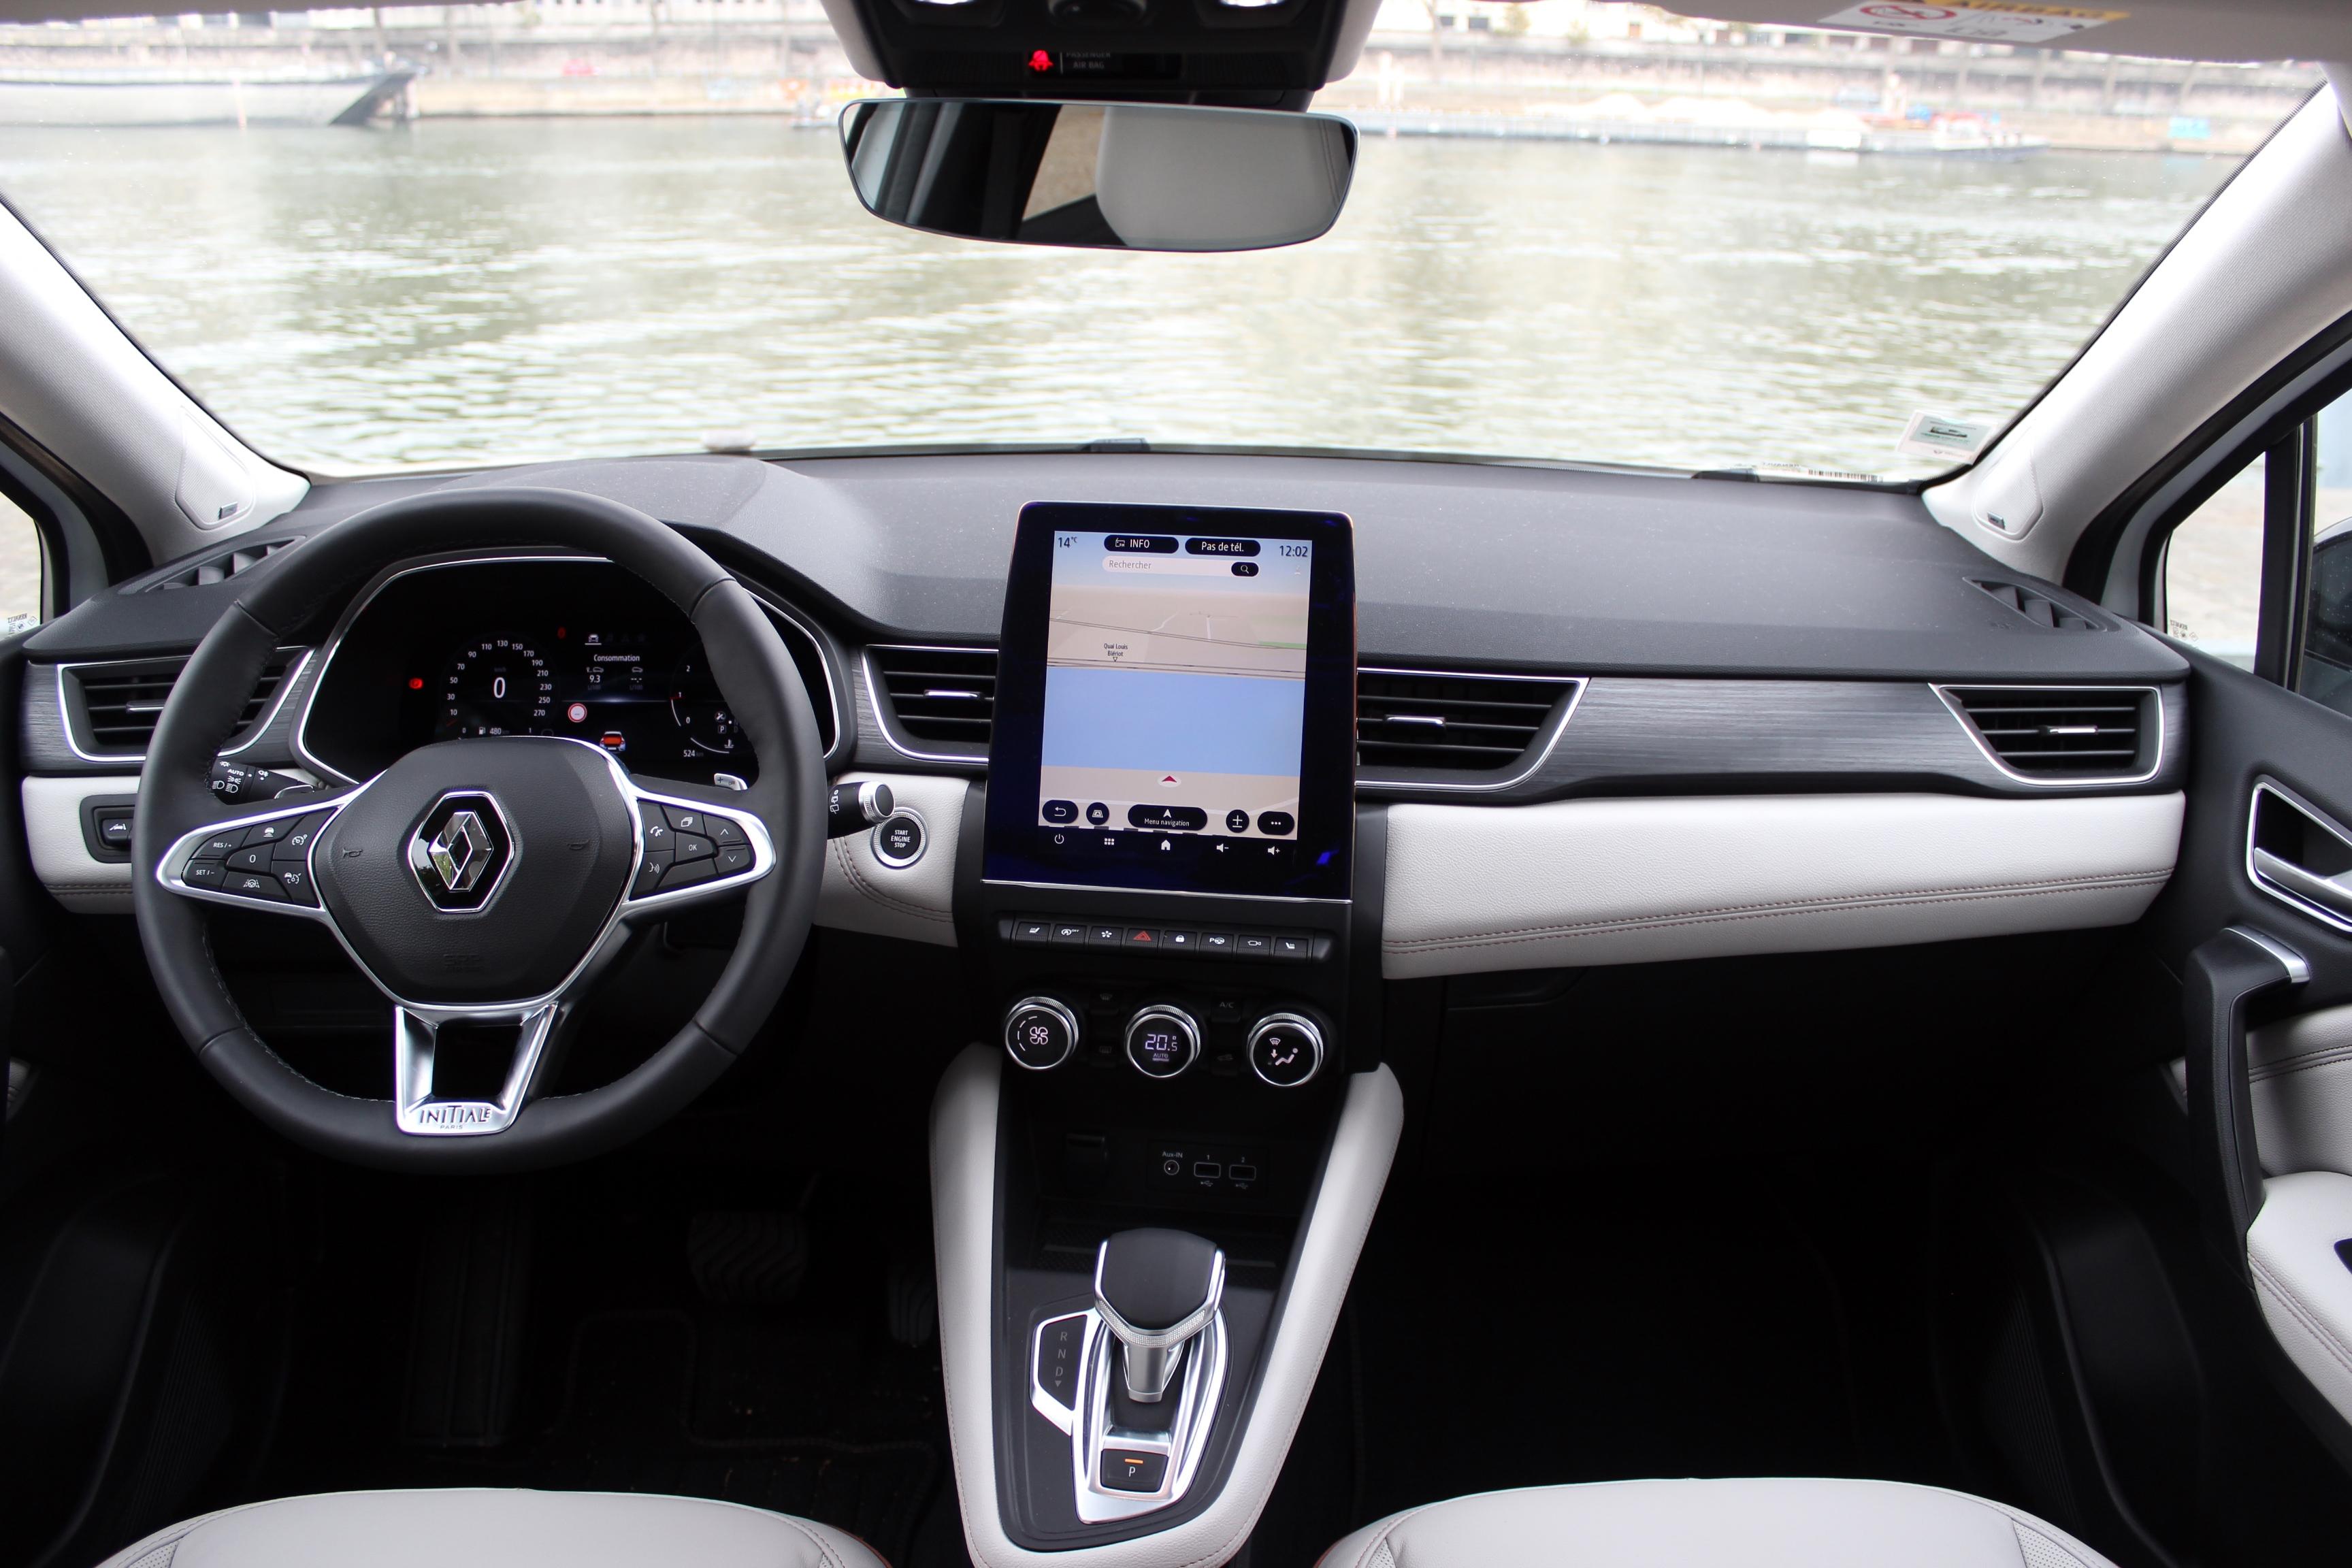 2019 - [Renault] Arkana [LJL] - Page 28 S0-comparatif-video-peugeot-2008-vs-renault-captur-607863